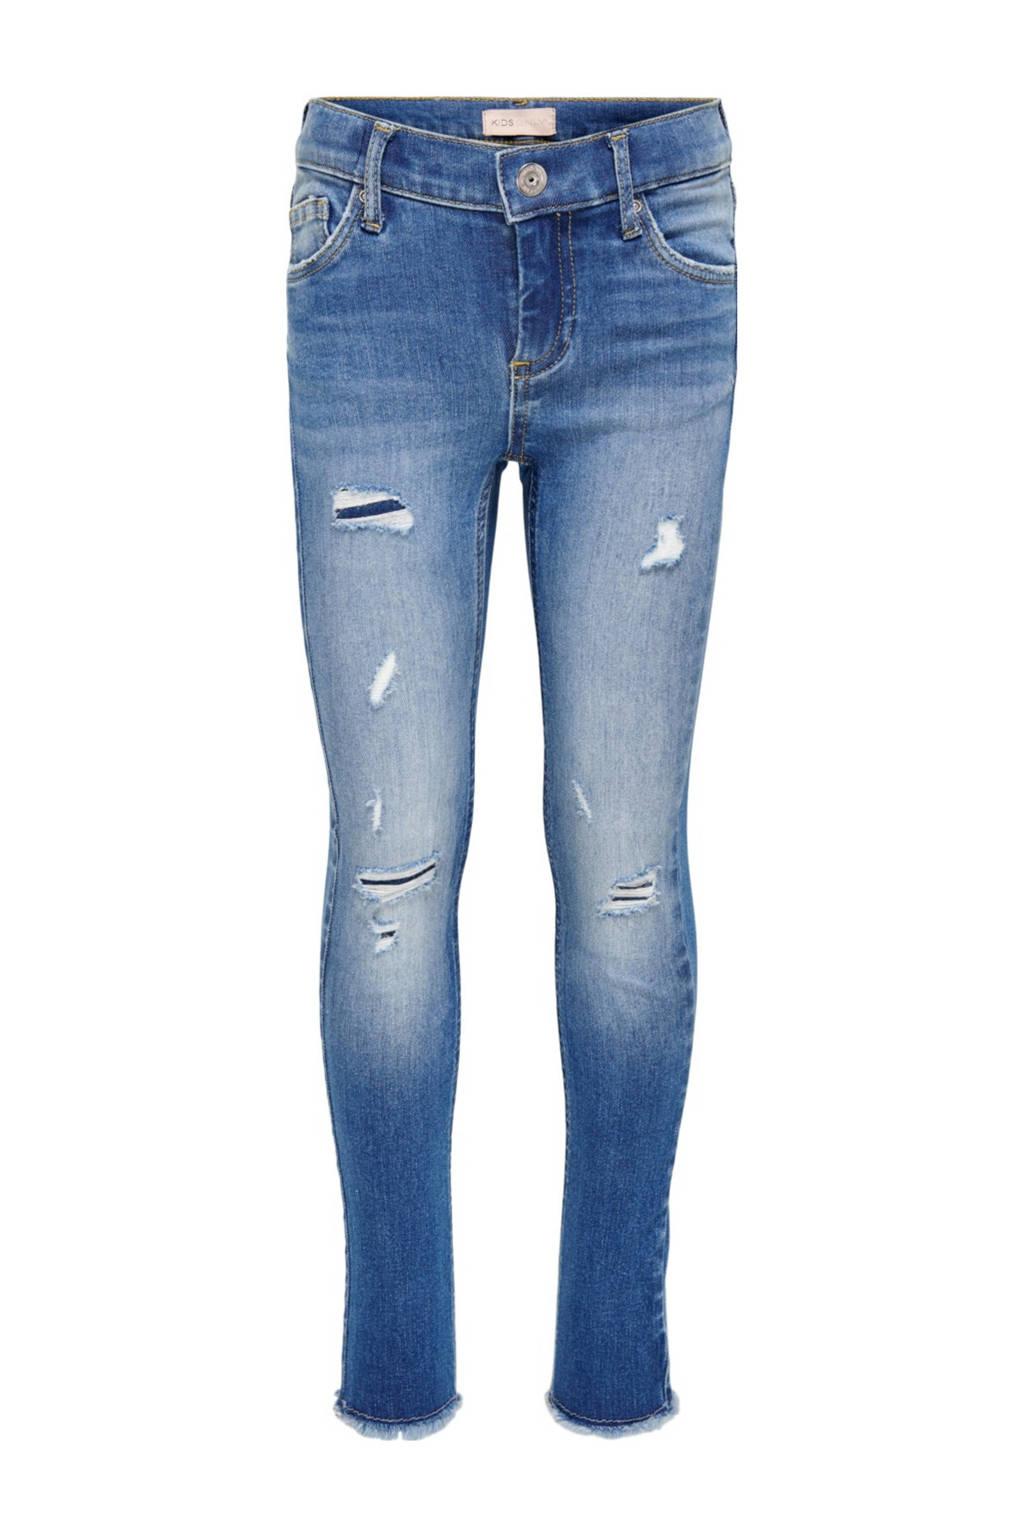 KIDS ONLY skinny jeans Blush stonewashed, Stonewashed